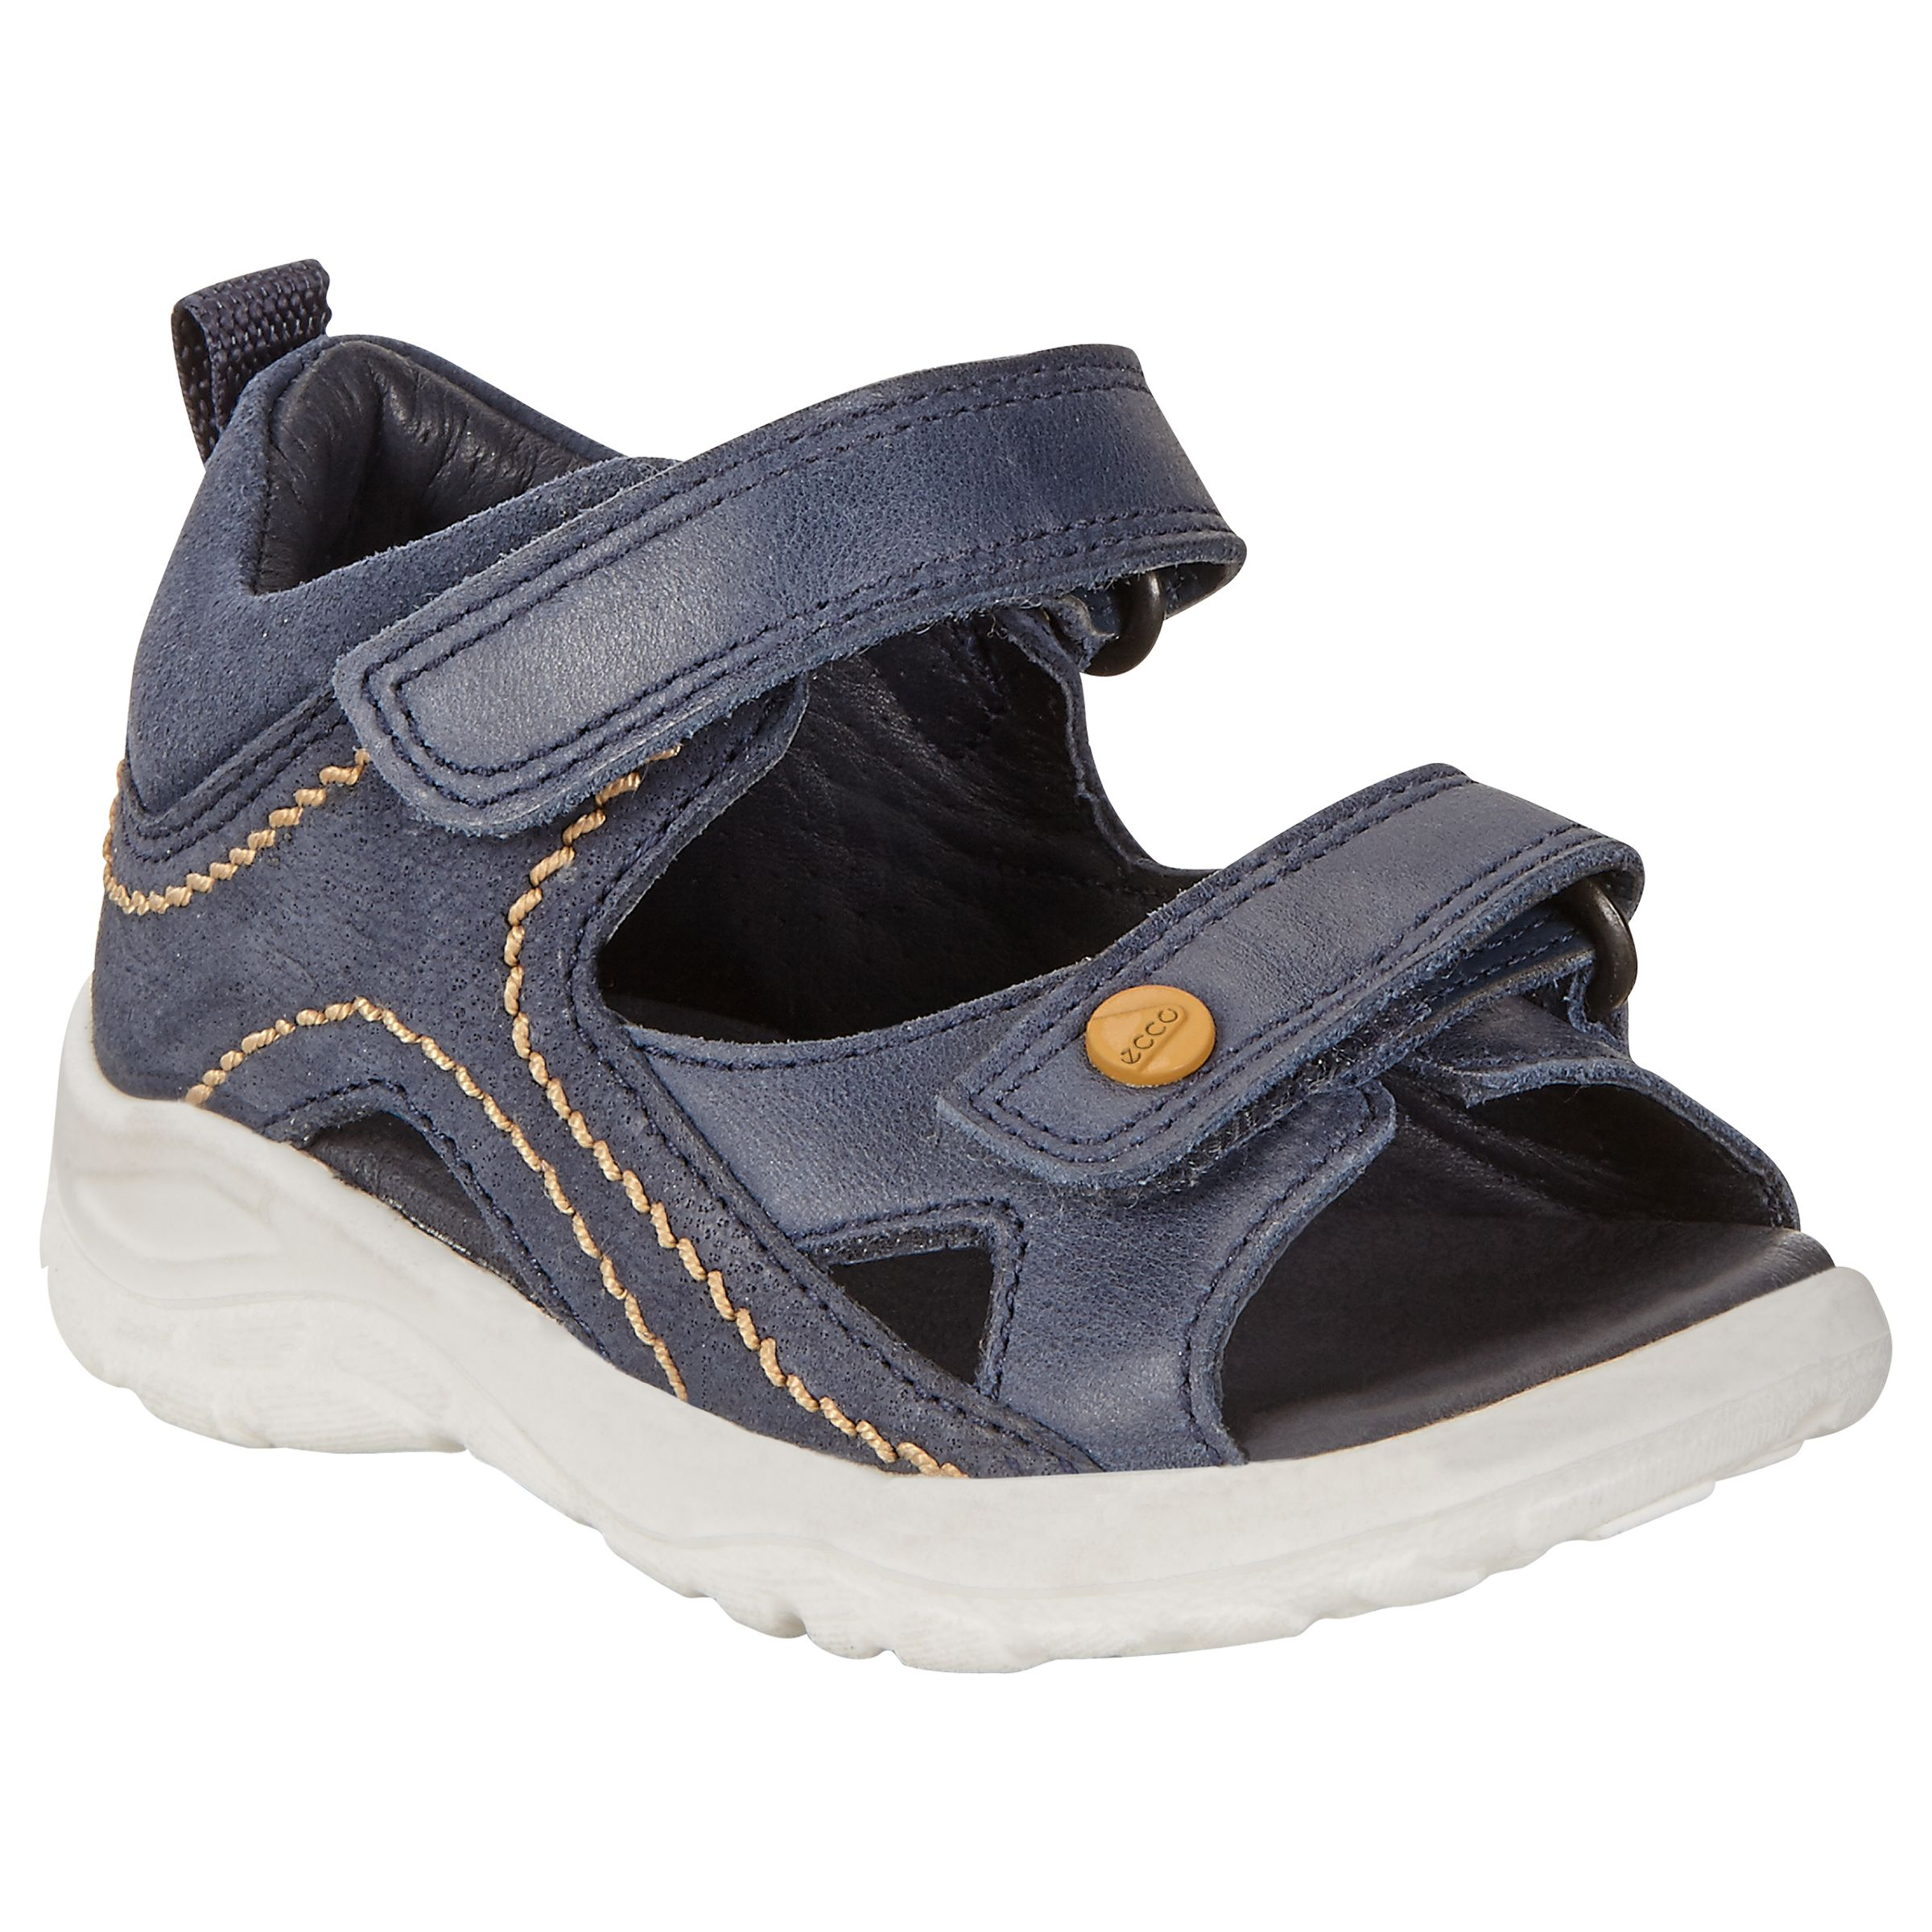 54237754f8023 ECCO Children's Peekaboo Sandals at John Lewis & Partners